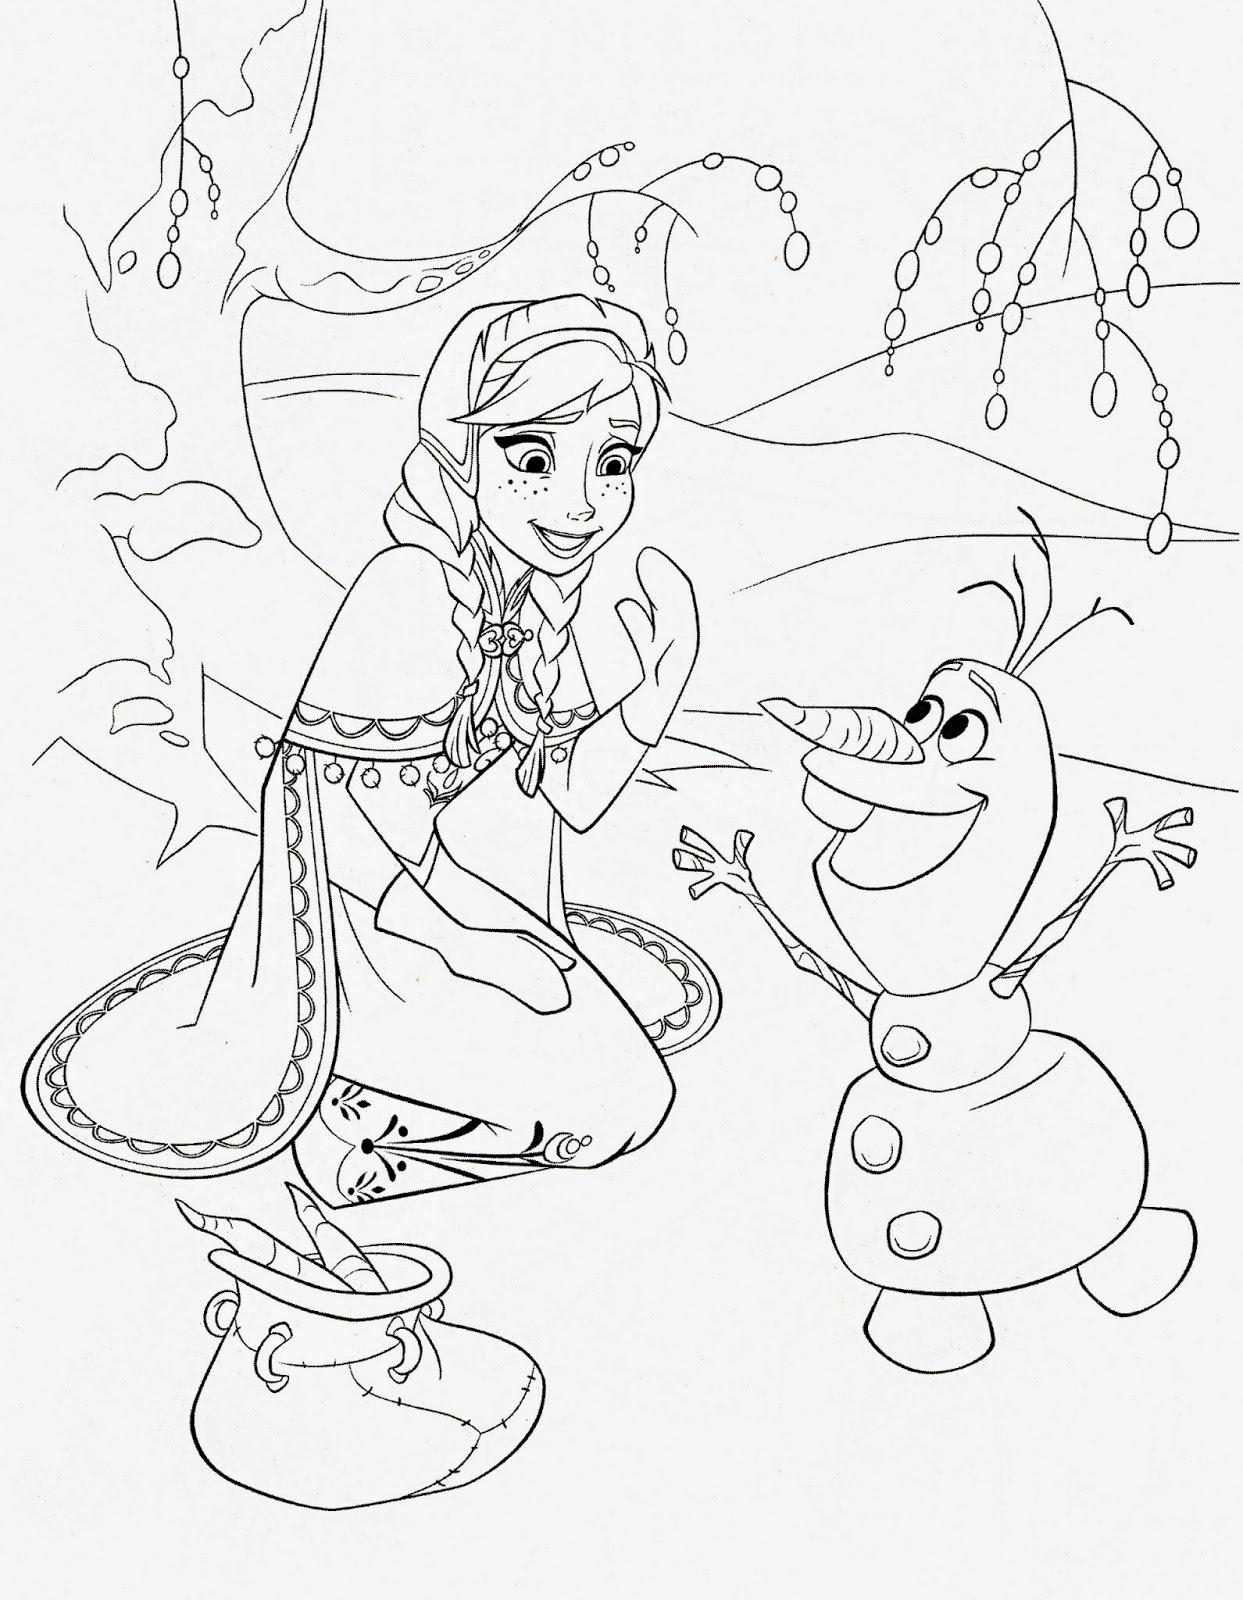 frozen coloring page disney frozen olaf coloring pages only coloring pages page frozen coloring